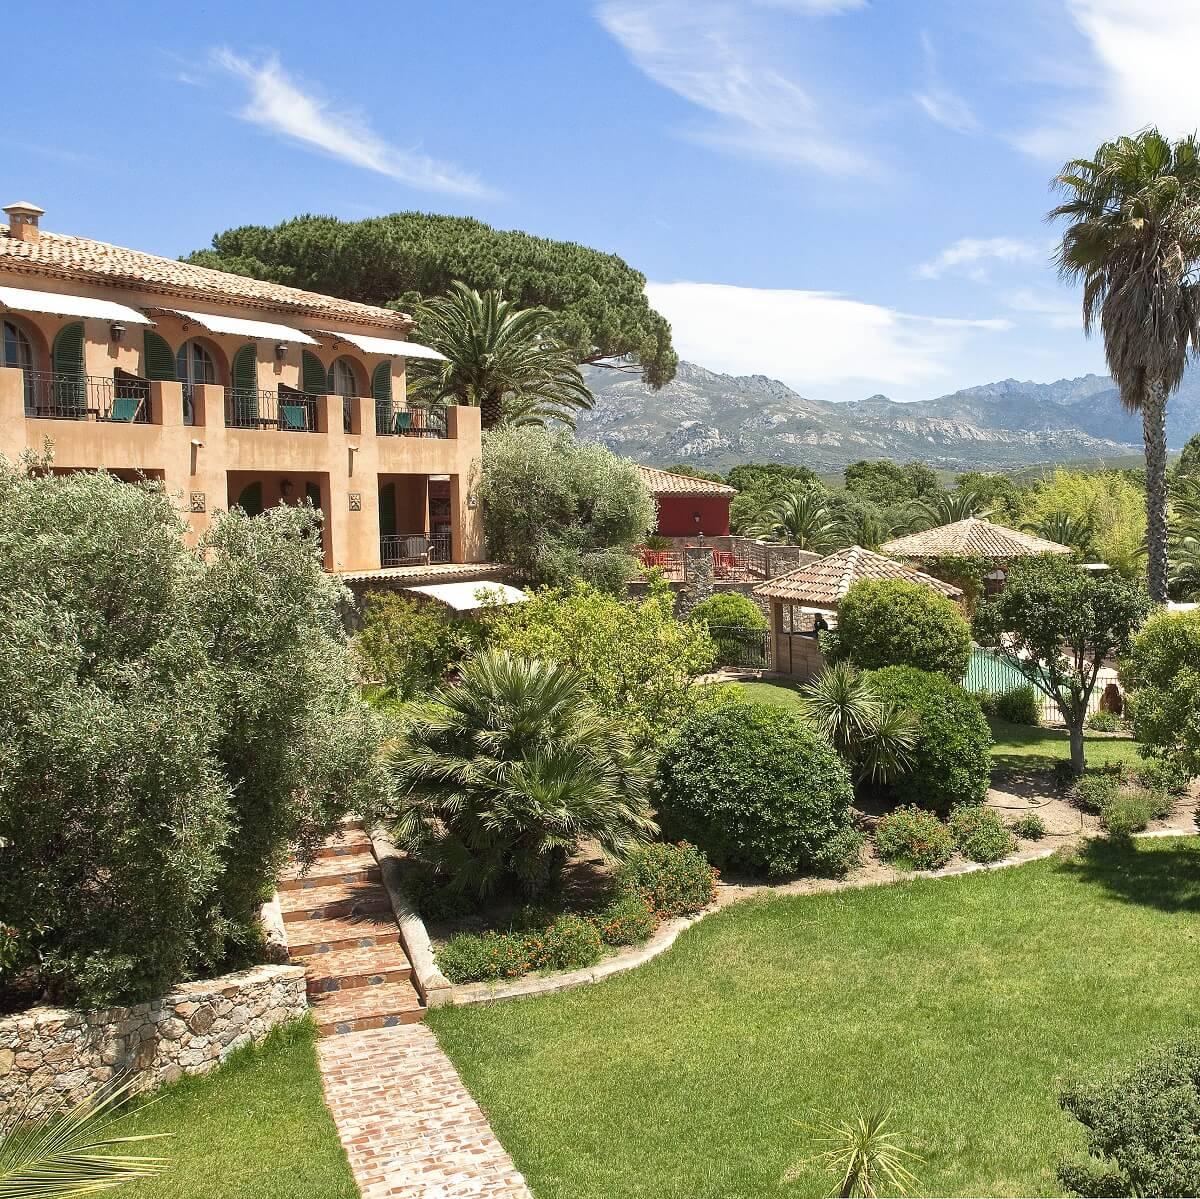 Jardin et bâtiments - Hôtel La Signoria - Calvi - Corse du sud